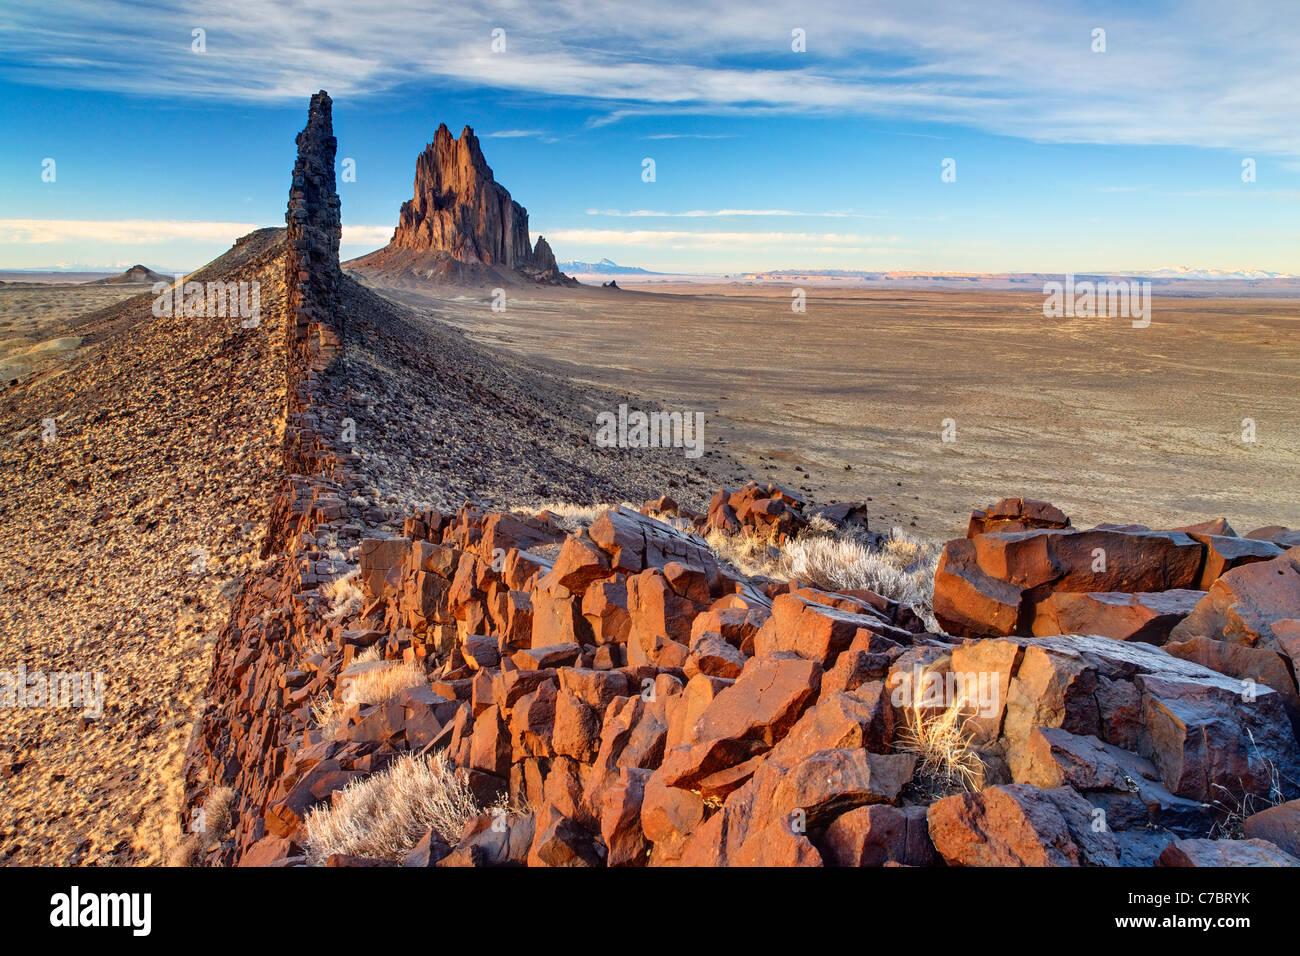 Shiprock Rock and black dike ridge, New Mexico, USA Stock Photo